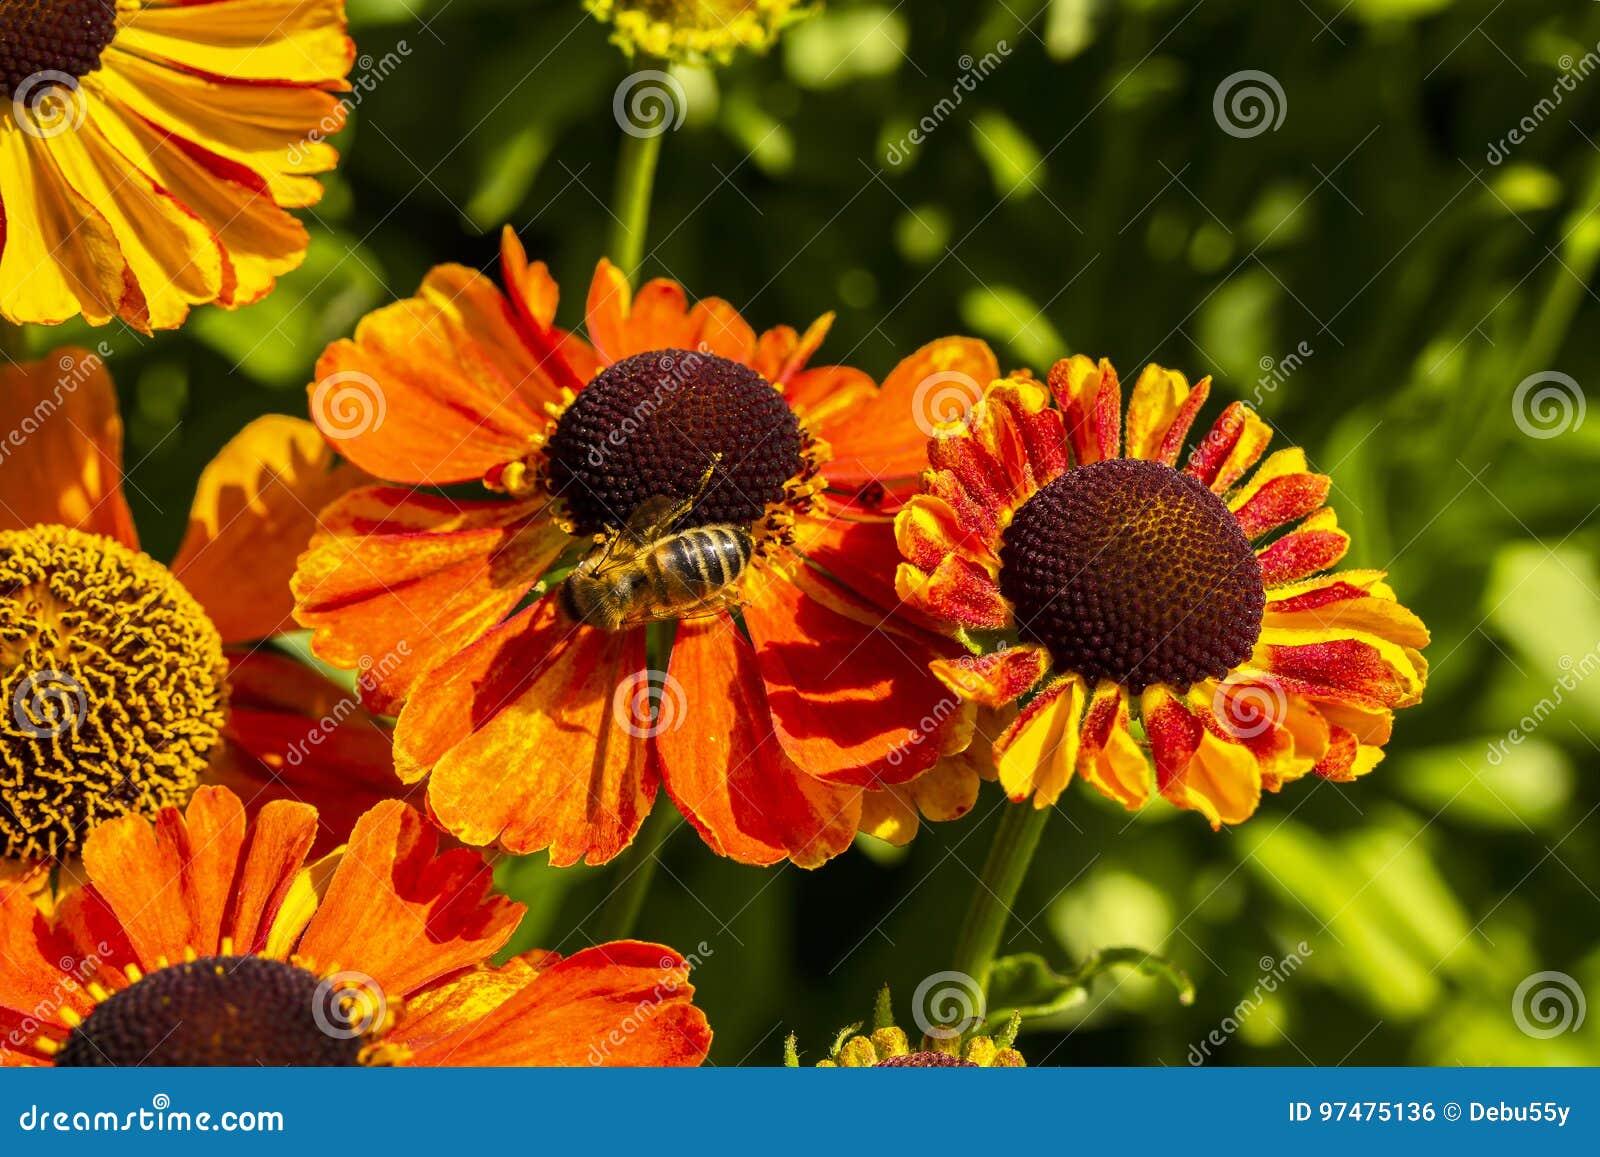 Rudbeckia flowers with honey bee close-up.